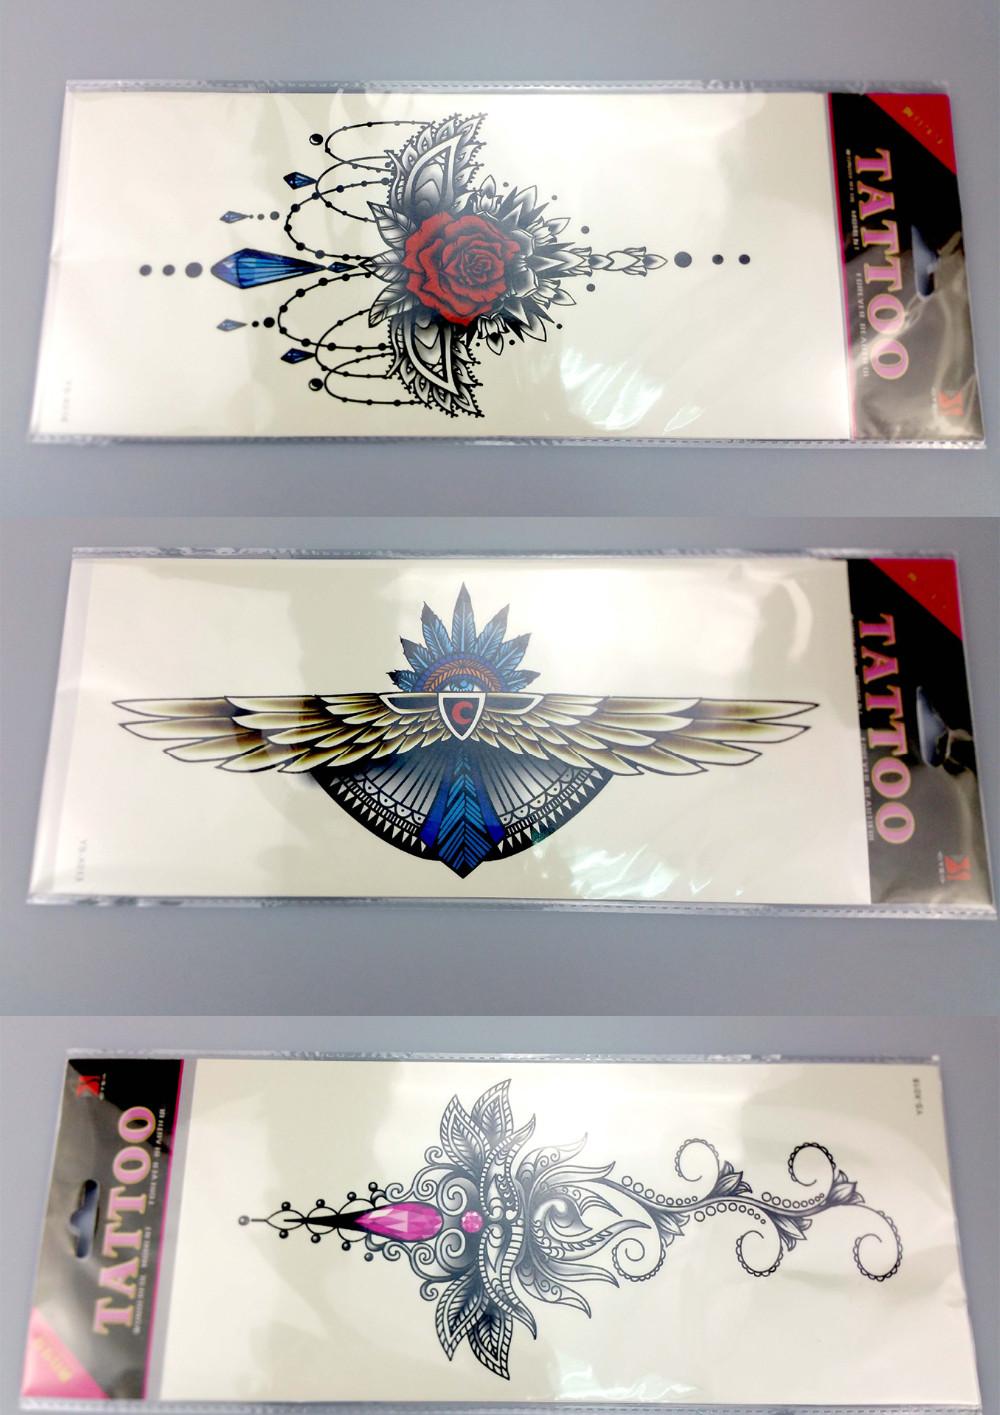 tessie shop body art painting tattoo stickers glitter Metal gold silver temporary flash tattoo Disposable indians tattoos tatoo 3